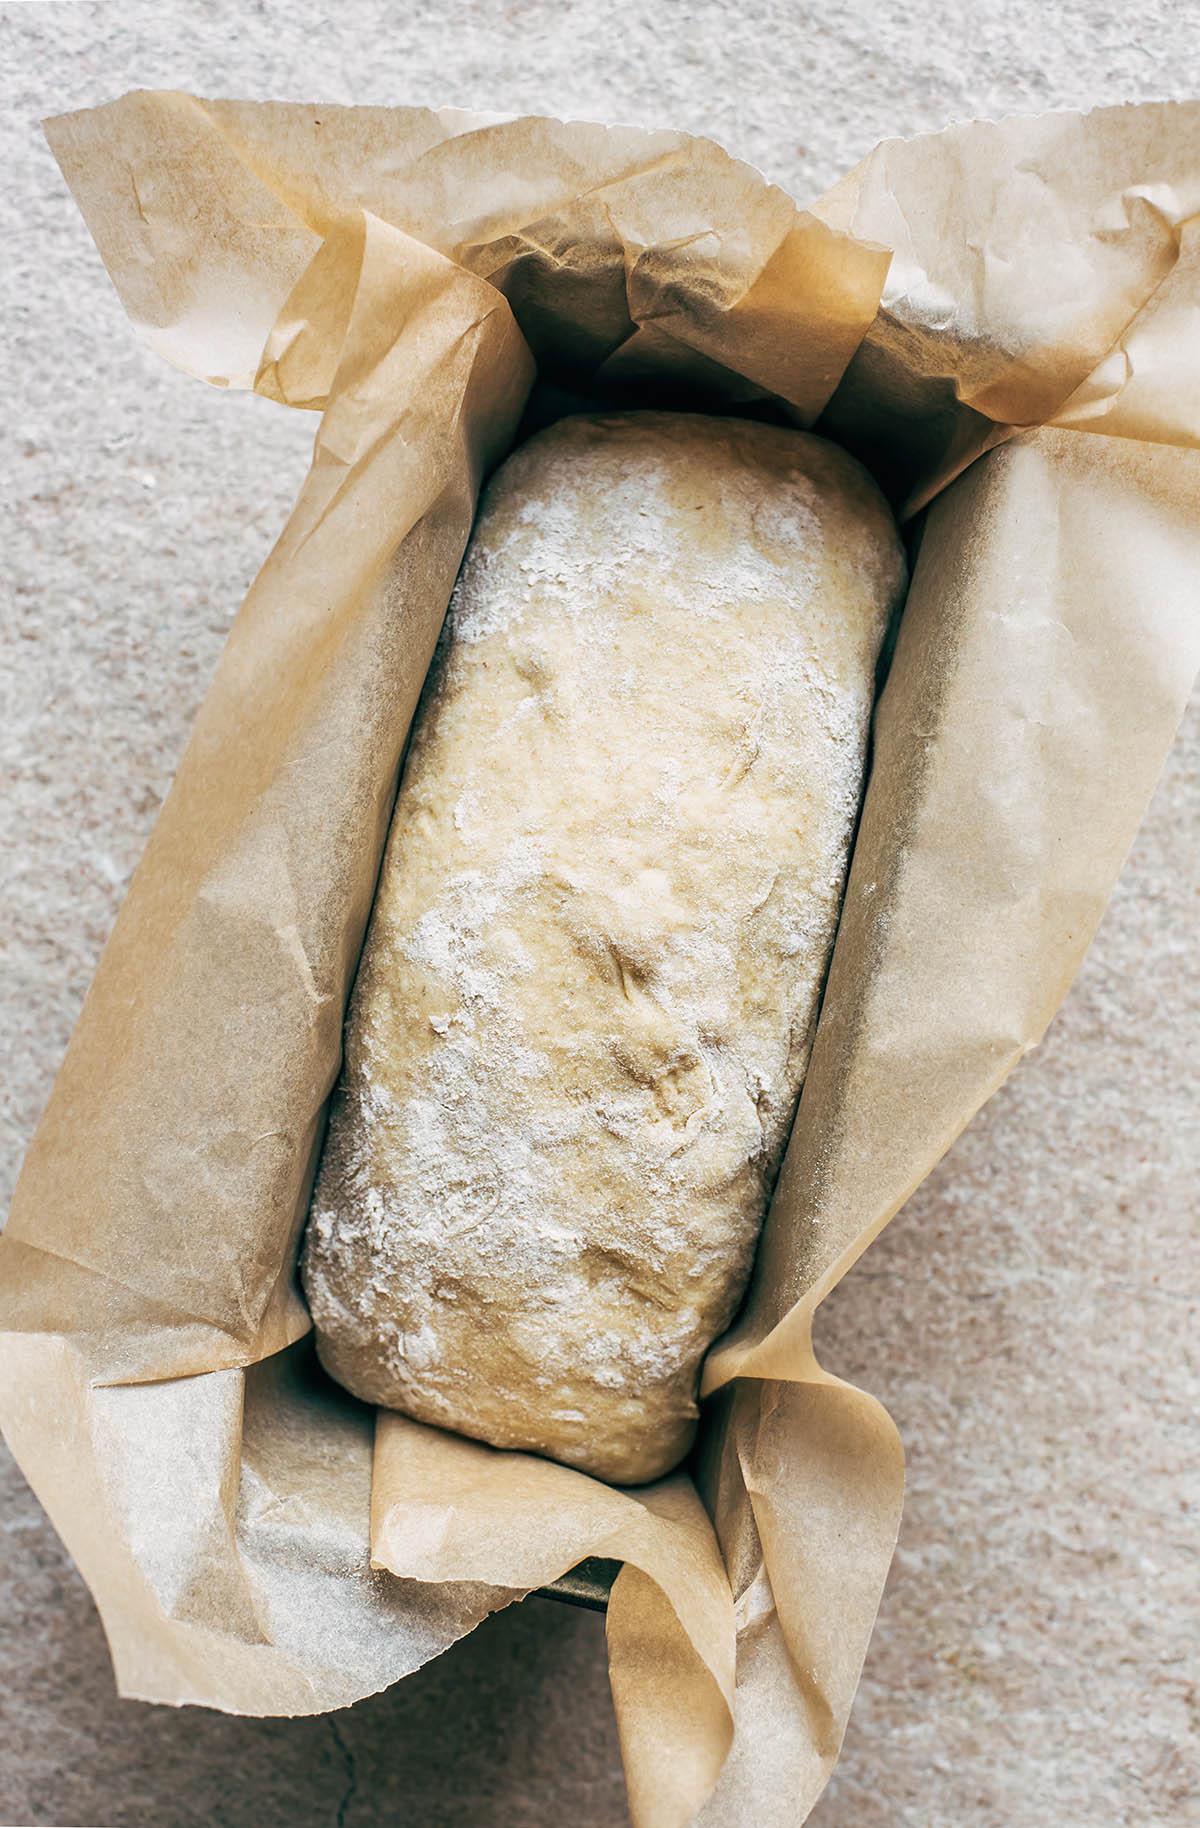 A loaf of sourdough sandwich bread rising in a tin.